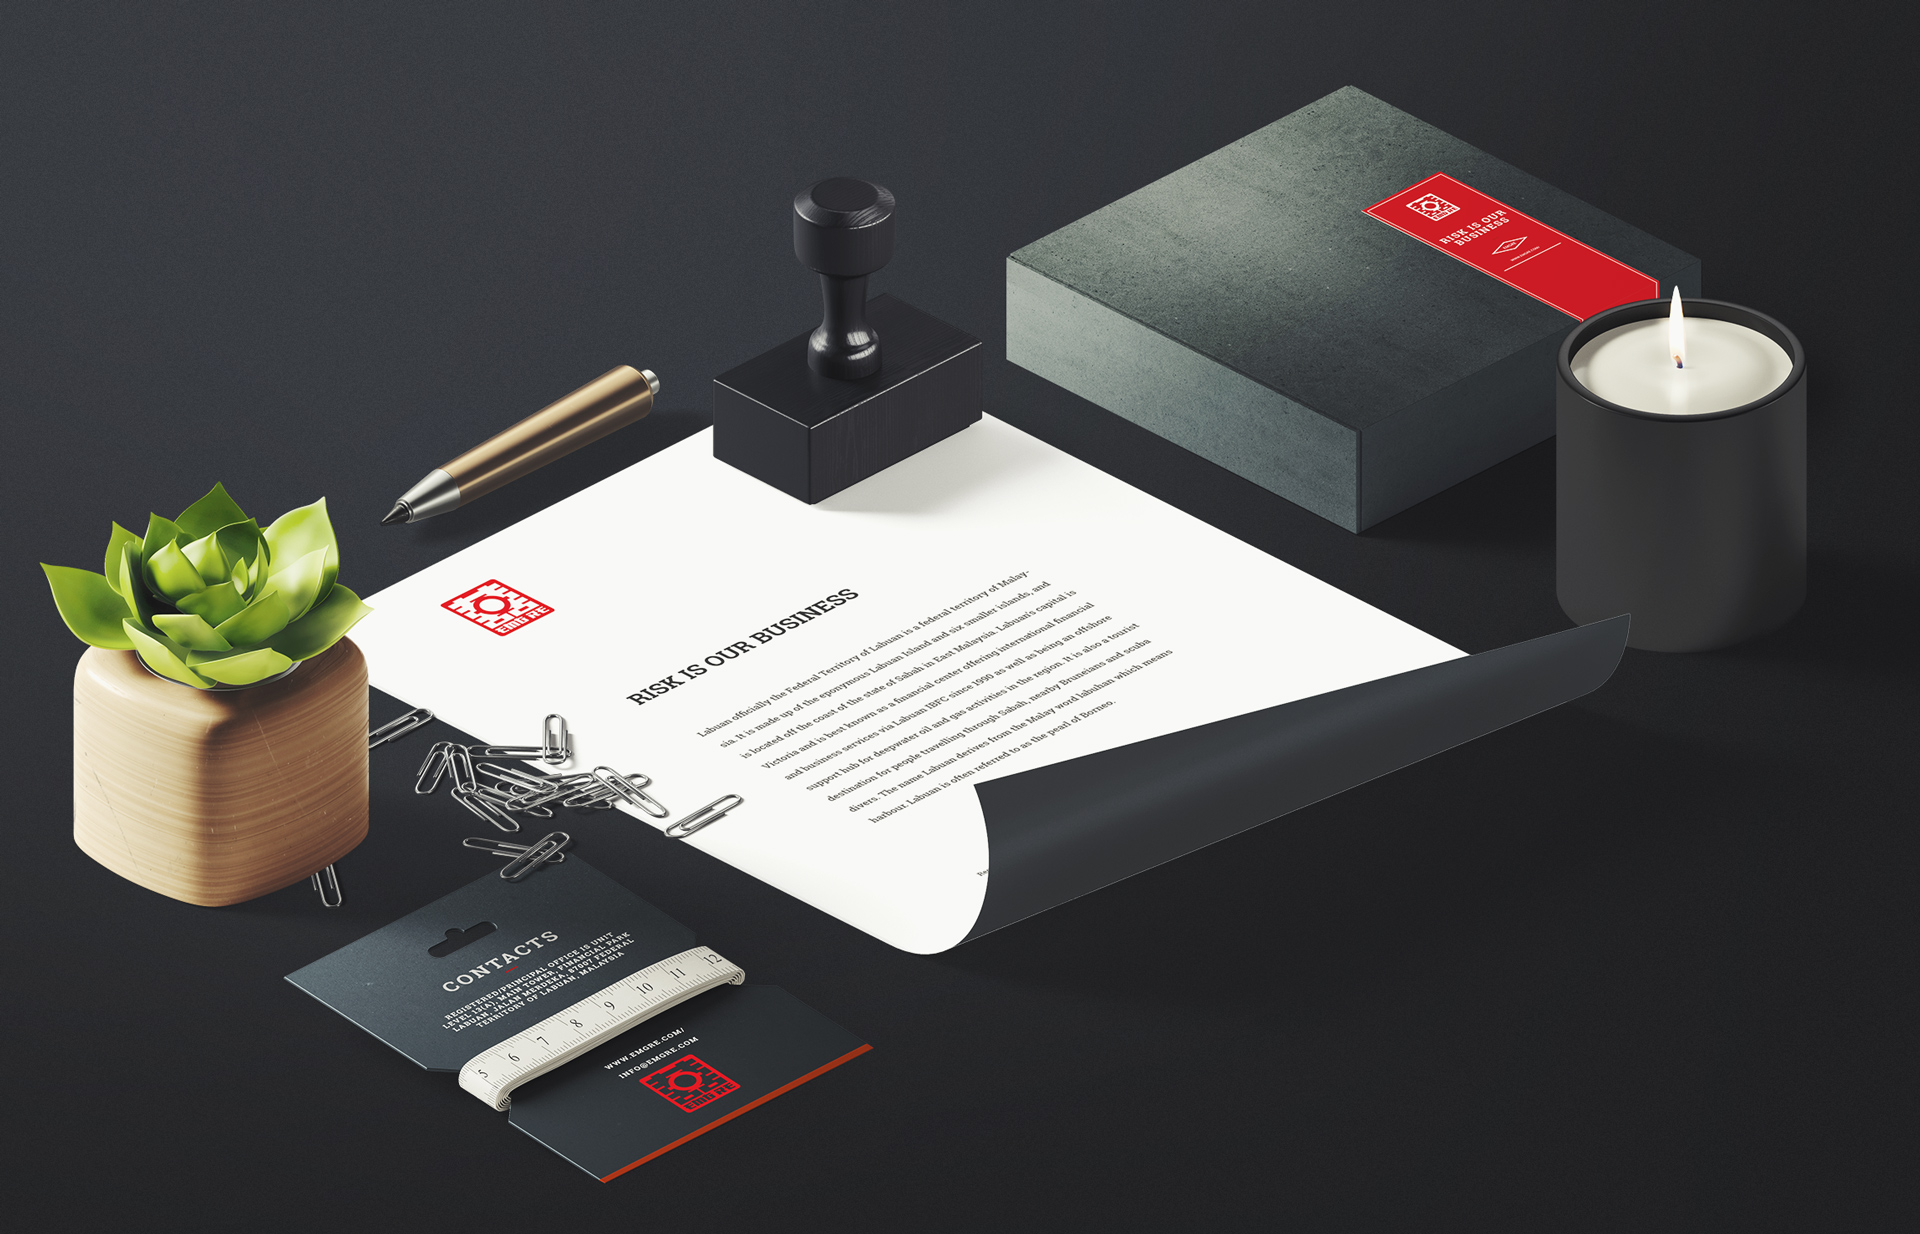 Разработка Корпоративного Сайта Для Компании EMG RE Ltd.